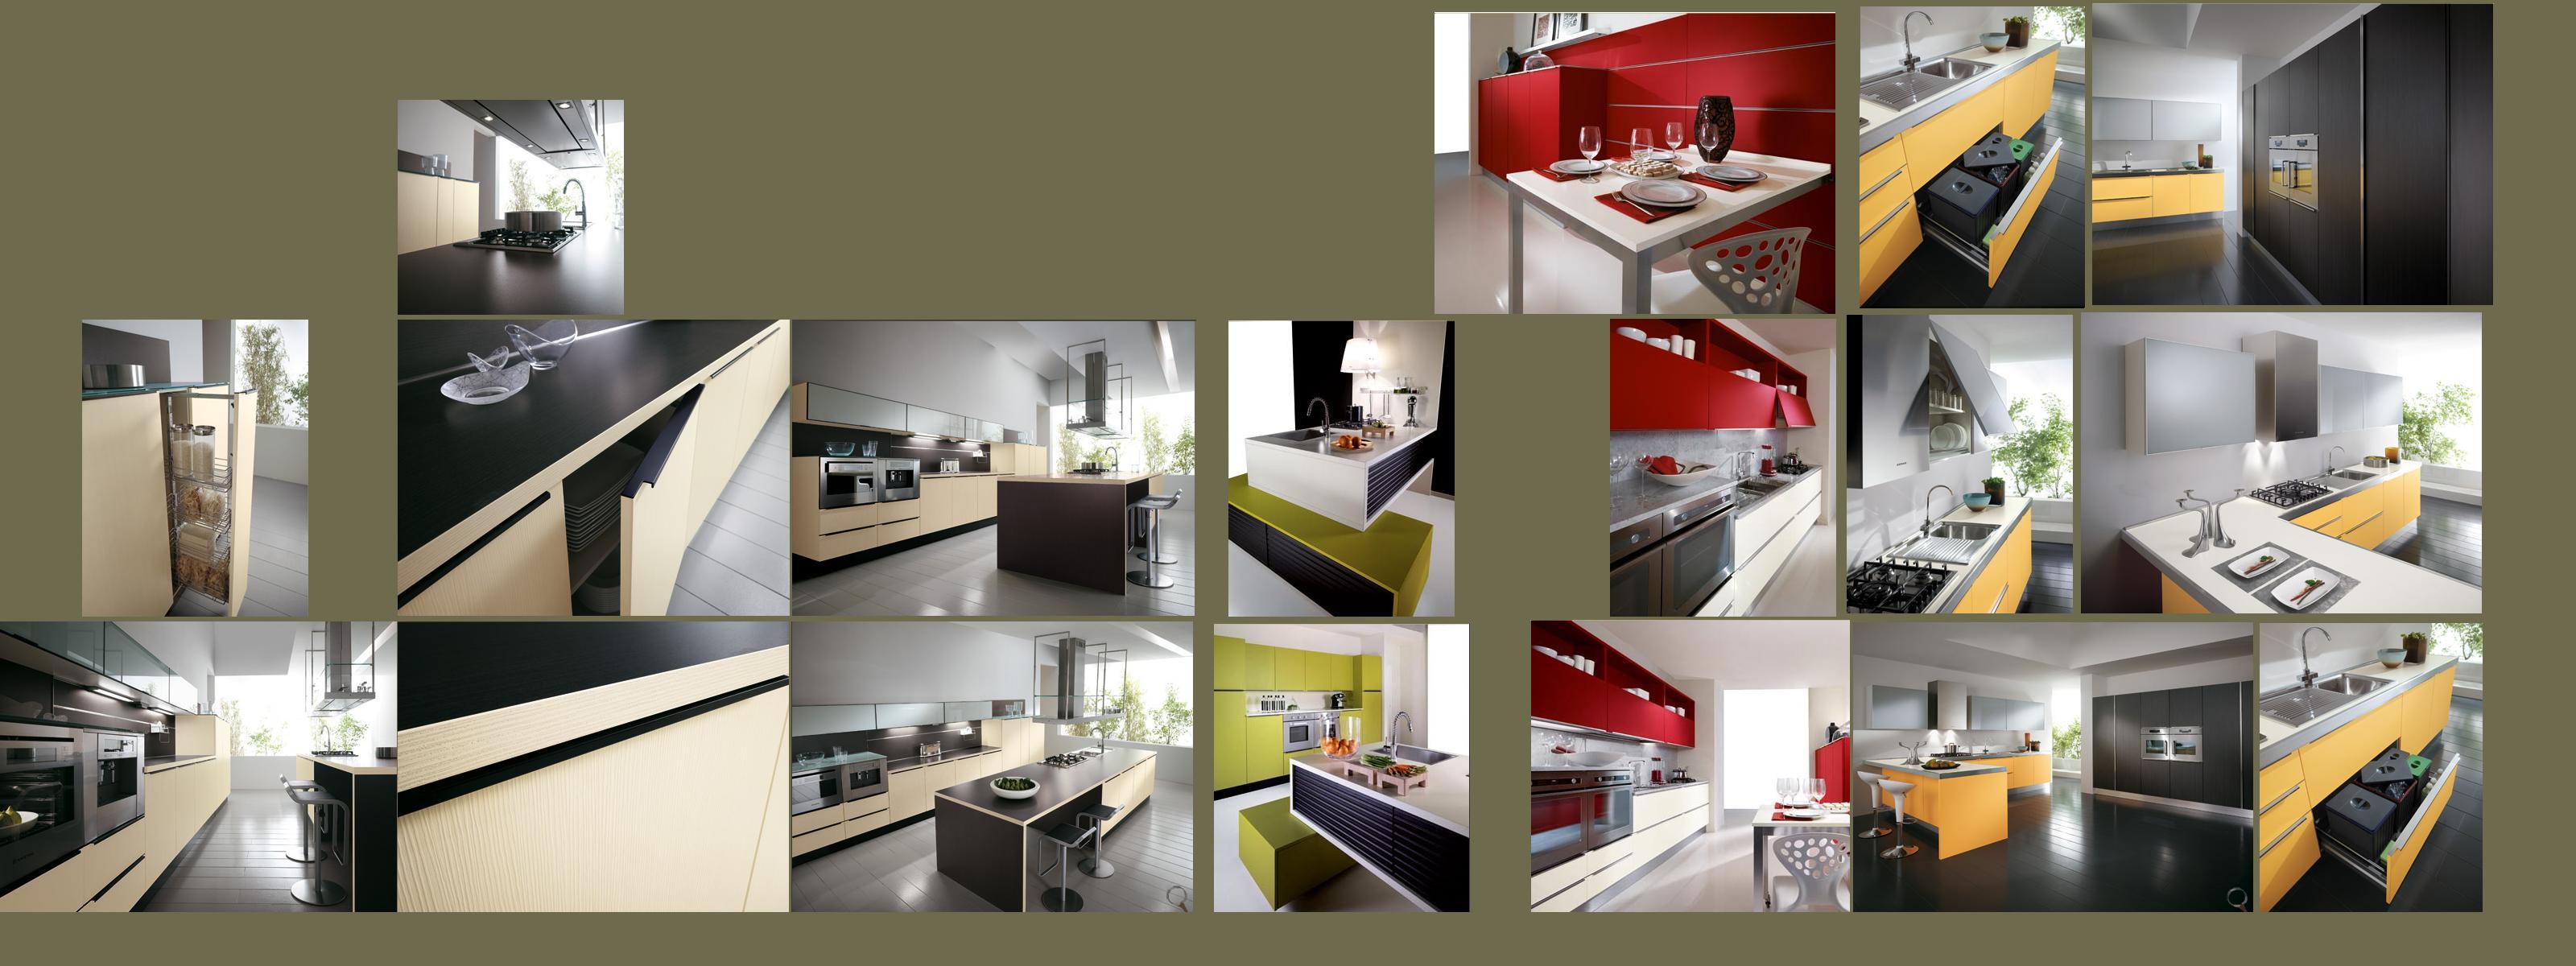 Cuisine en polymere 10 photo de cuisine moderne design for Cuisine en polymere